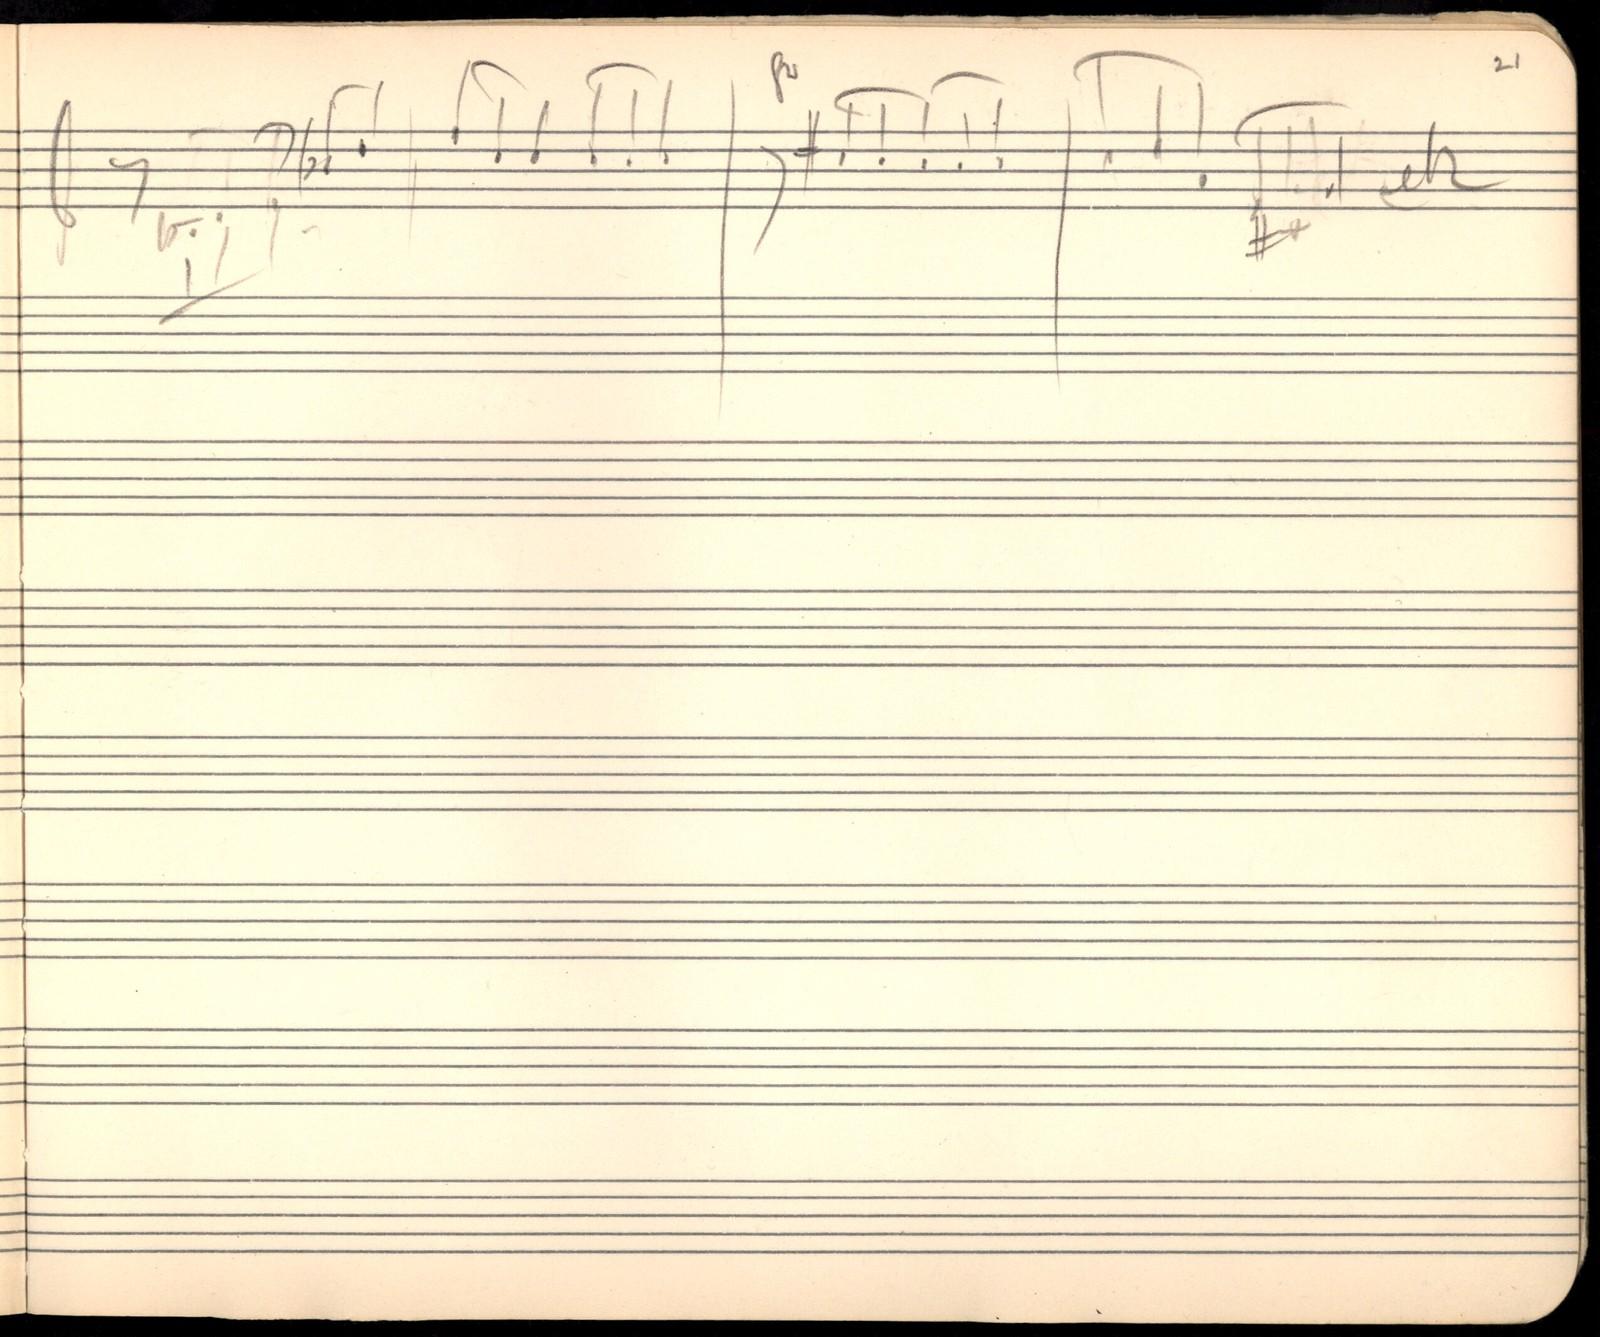 Sketchbook 5 [sketches for woodwind partita and string quartet, pencil]